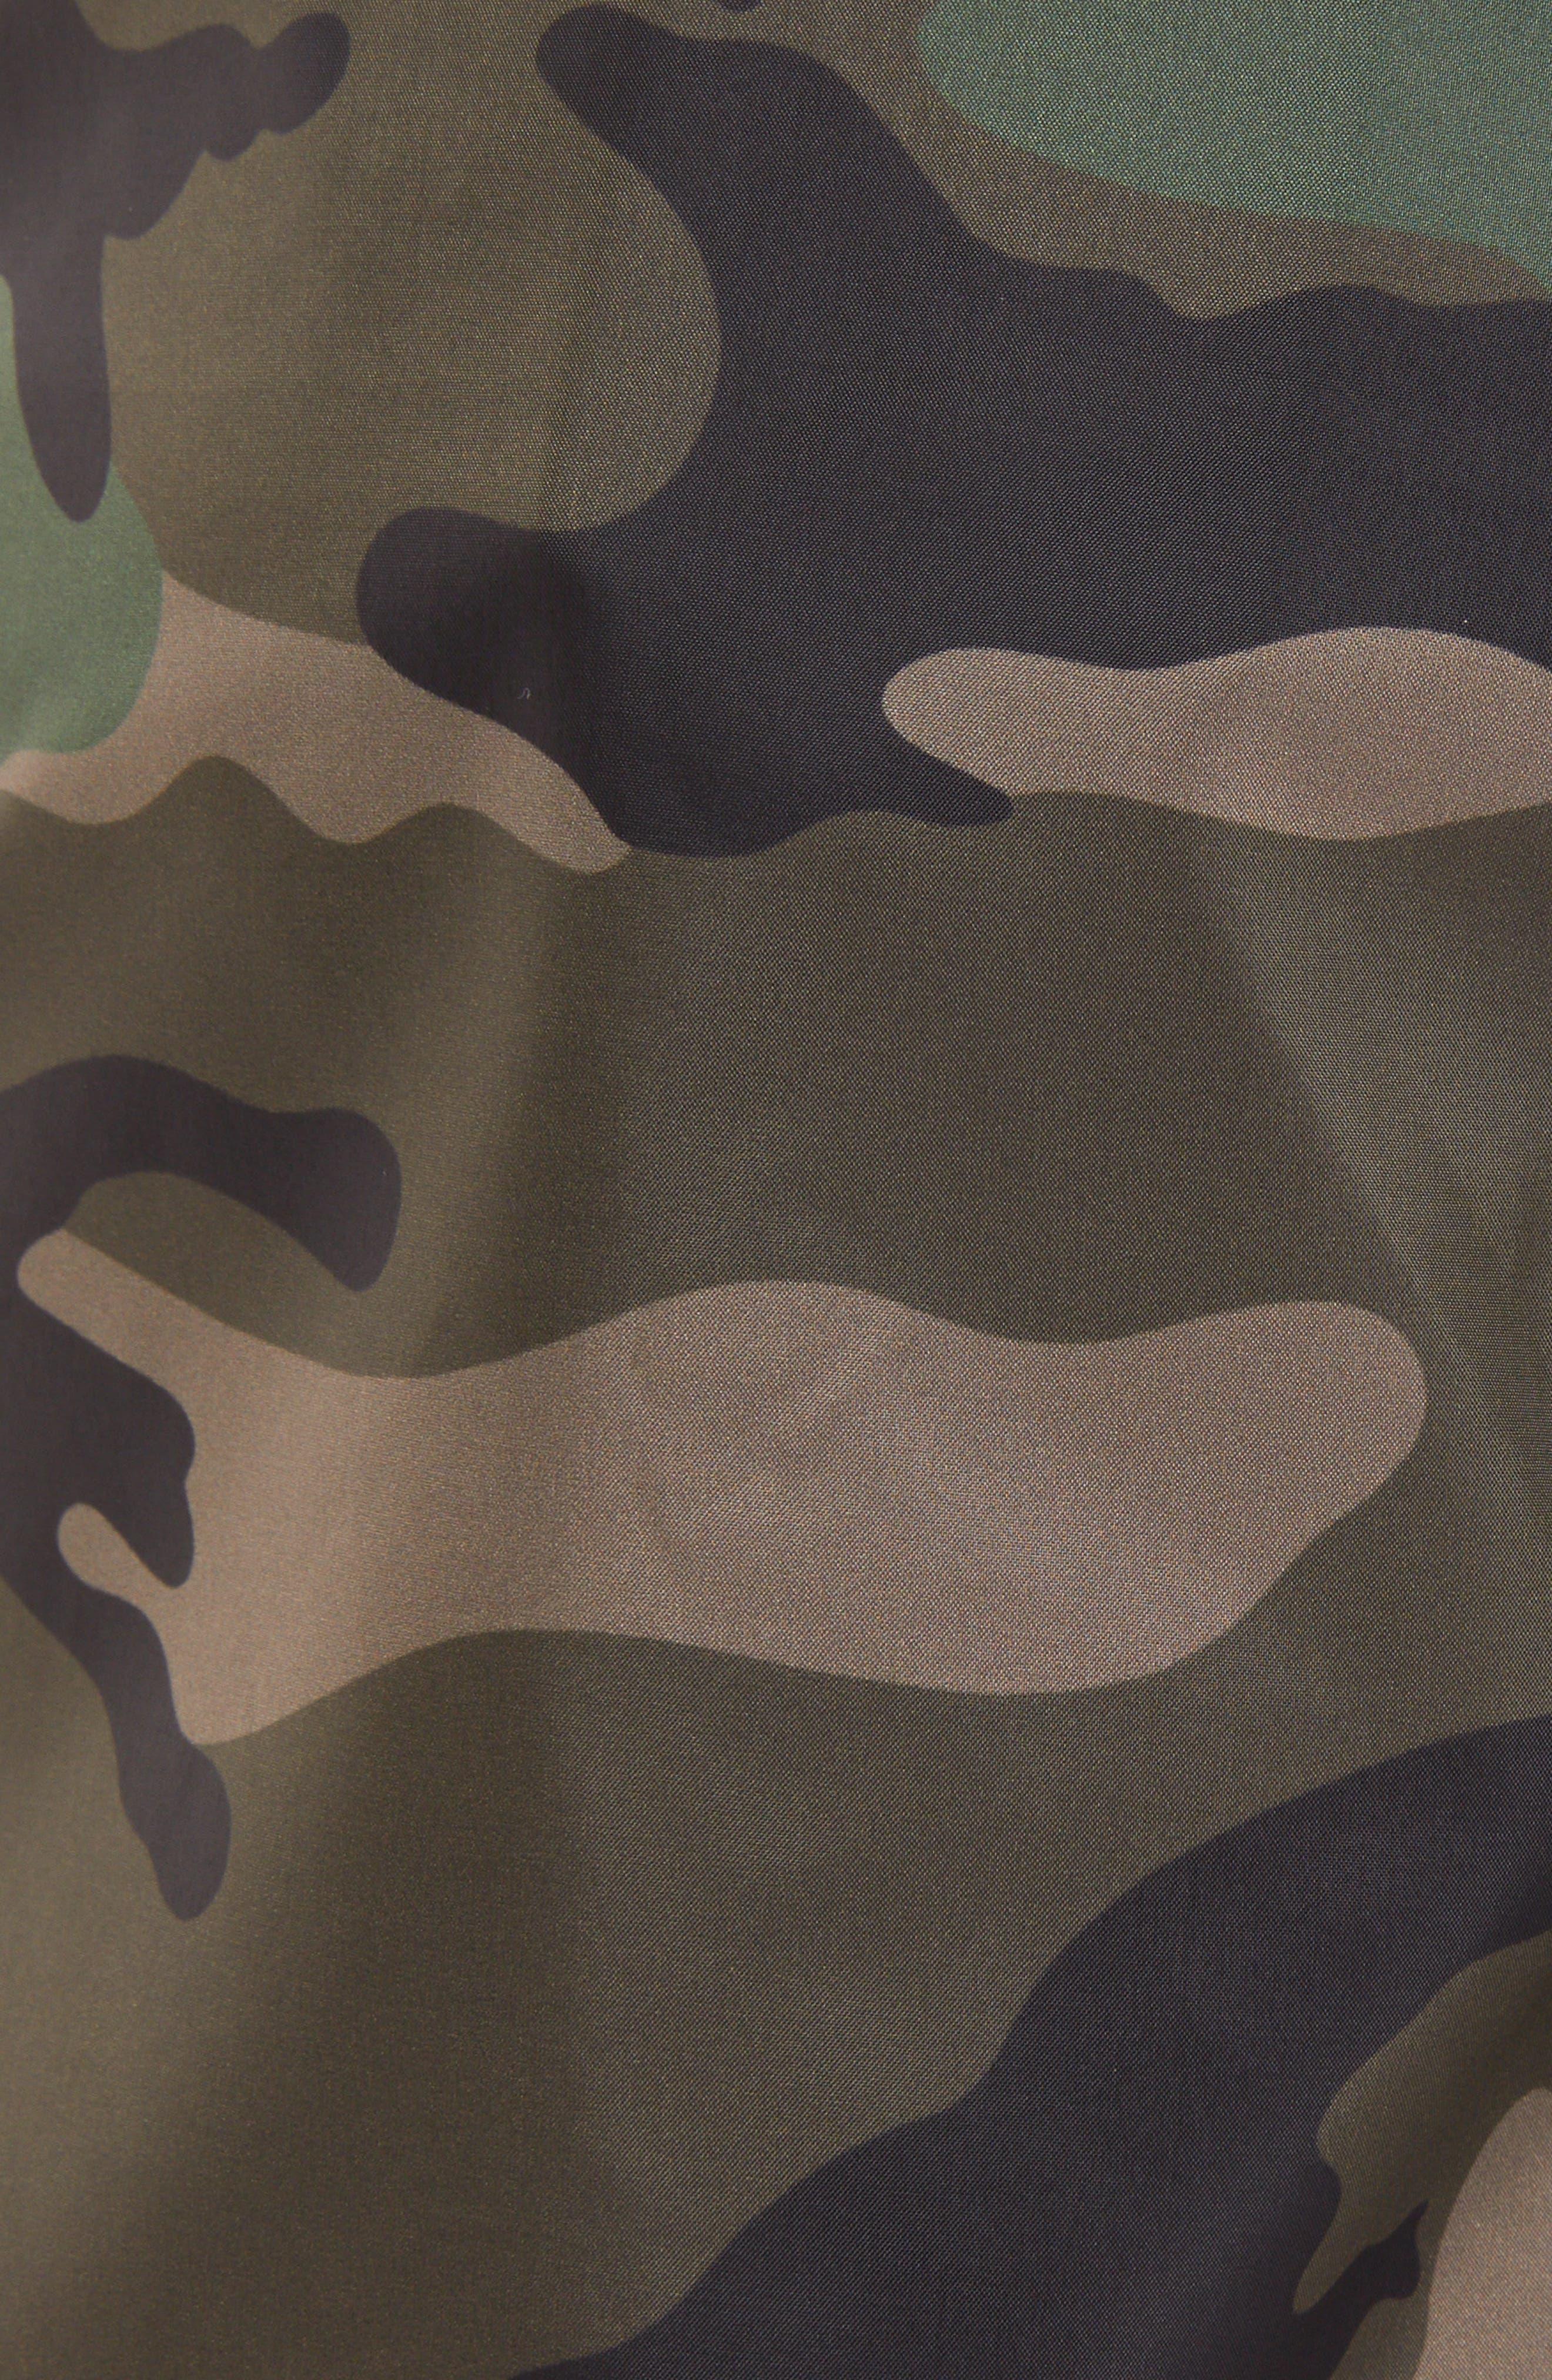 VLTN Camo Swim Trunks,                             Alternate thumbnail 5, color,                             CAMOU ARMY